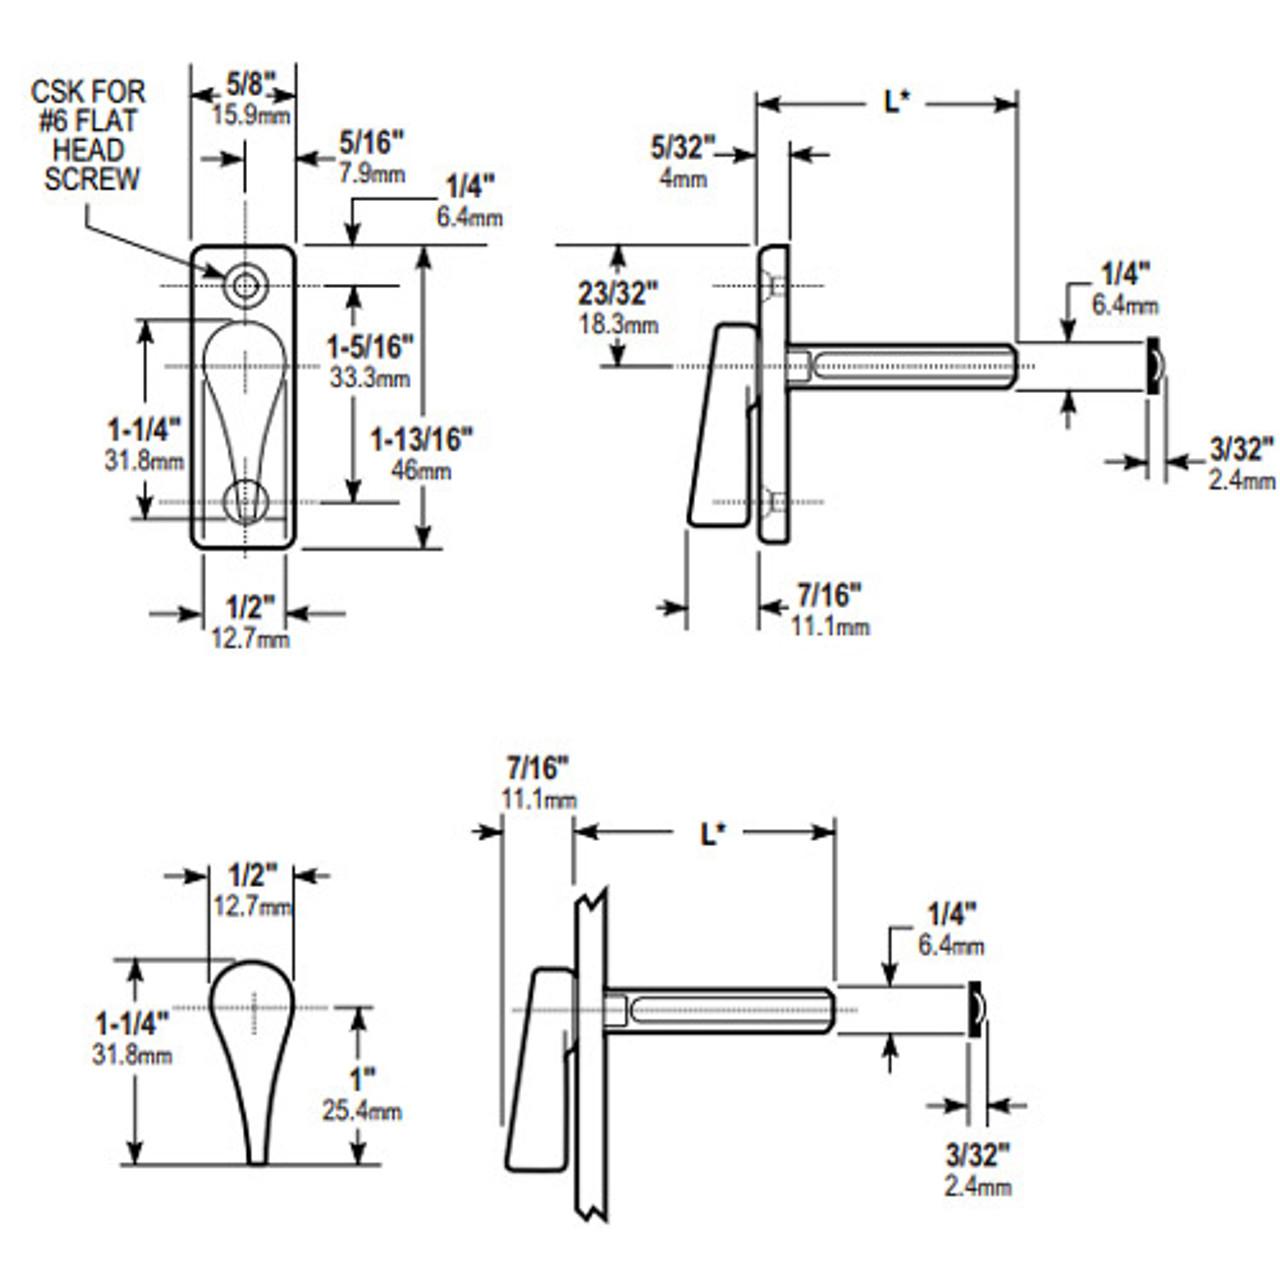 1000-21-26-121 Adams Rite 1000 Series Turns Dimensional View